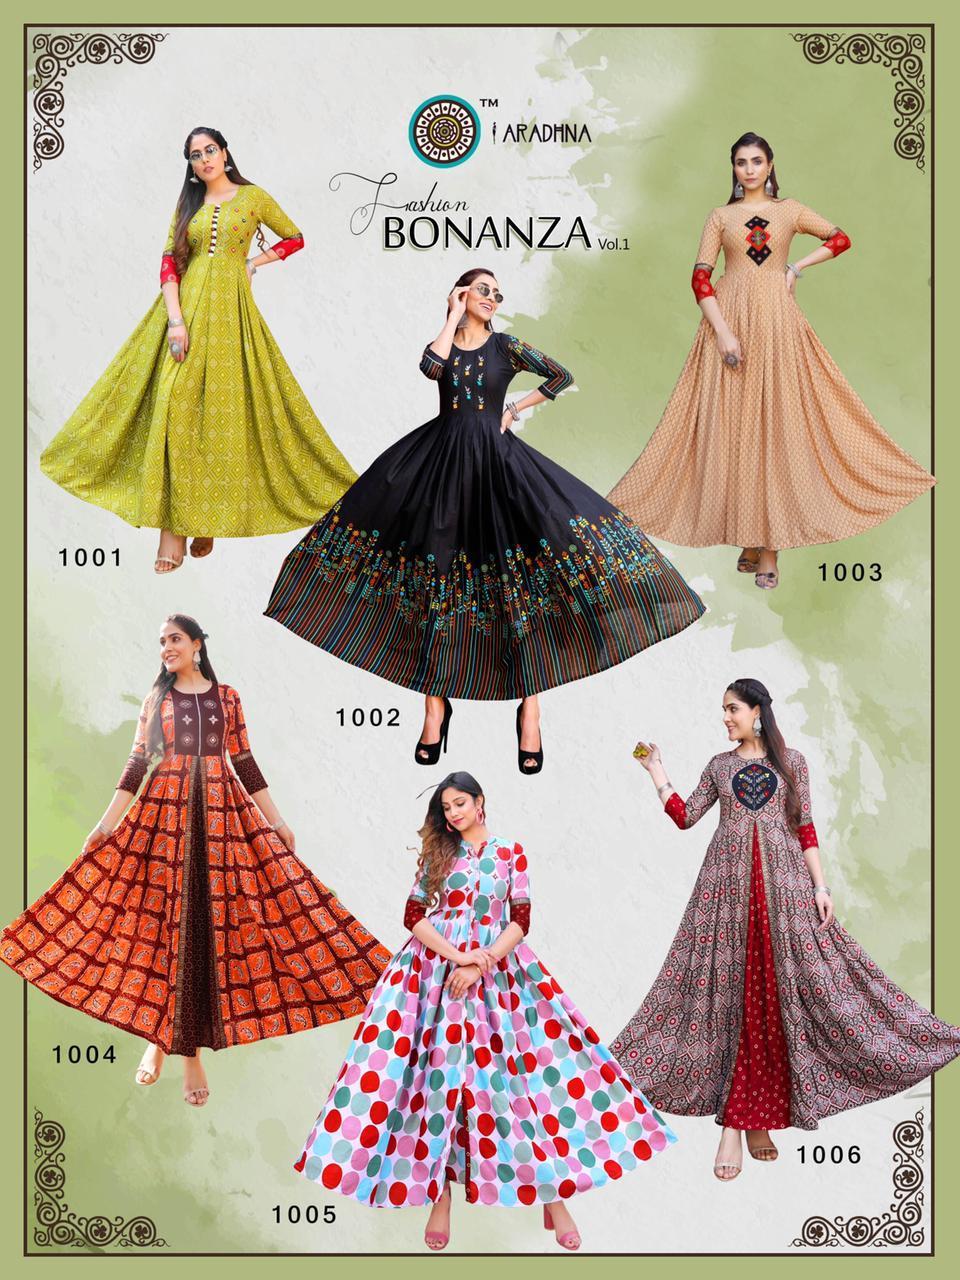 Aradhna Fashion Bonanza Vol 1 Kurti Wholesale Catalog 12 Pcs 19 - Aradhna Fashion Bonanza Vol 1 Kurti Wholesale Catalog 12 Pcs